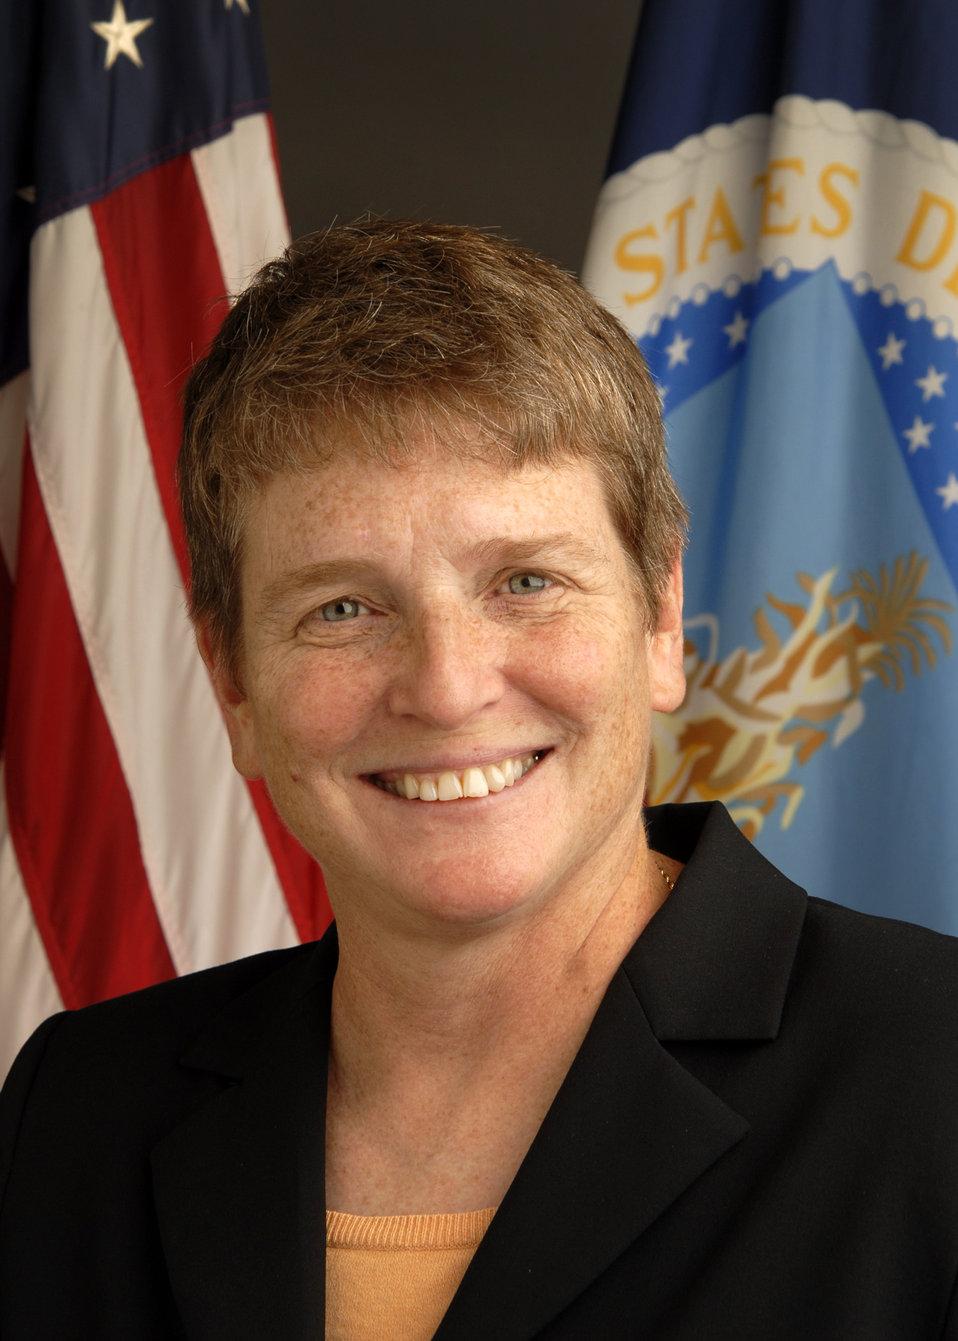 20120807-OSEC-KJH-2852 Deputy Assistant Secretary for Departmental Management, Robin Heard